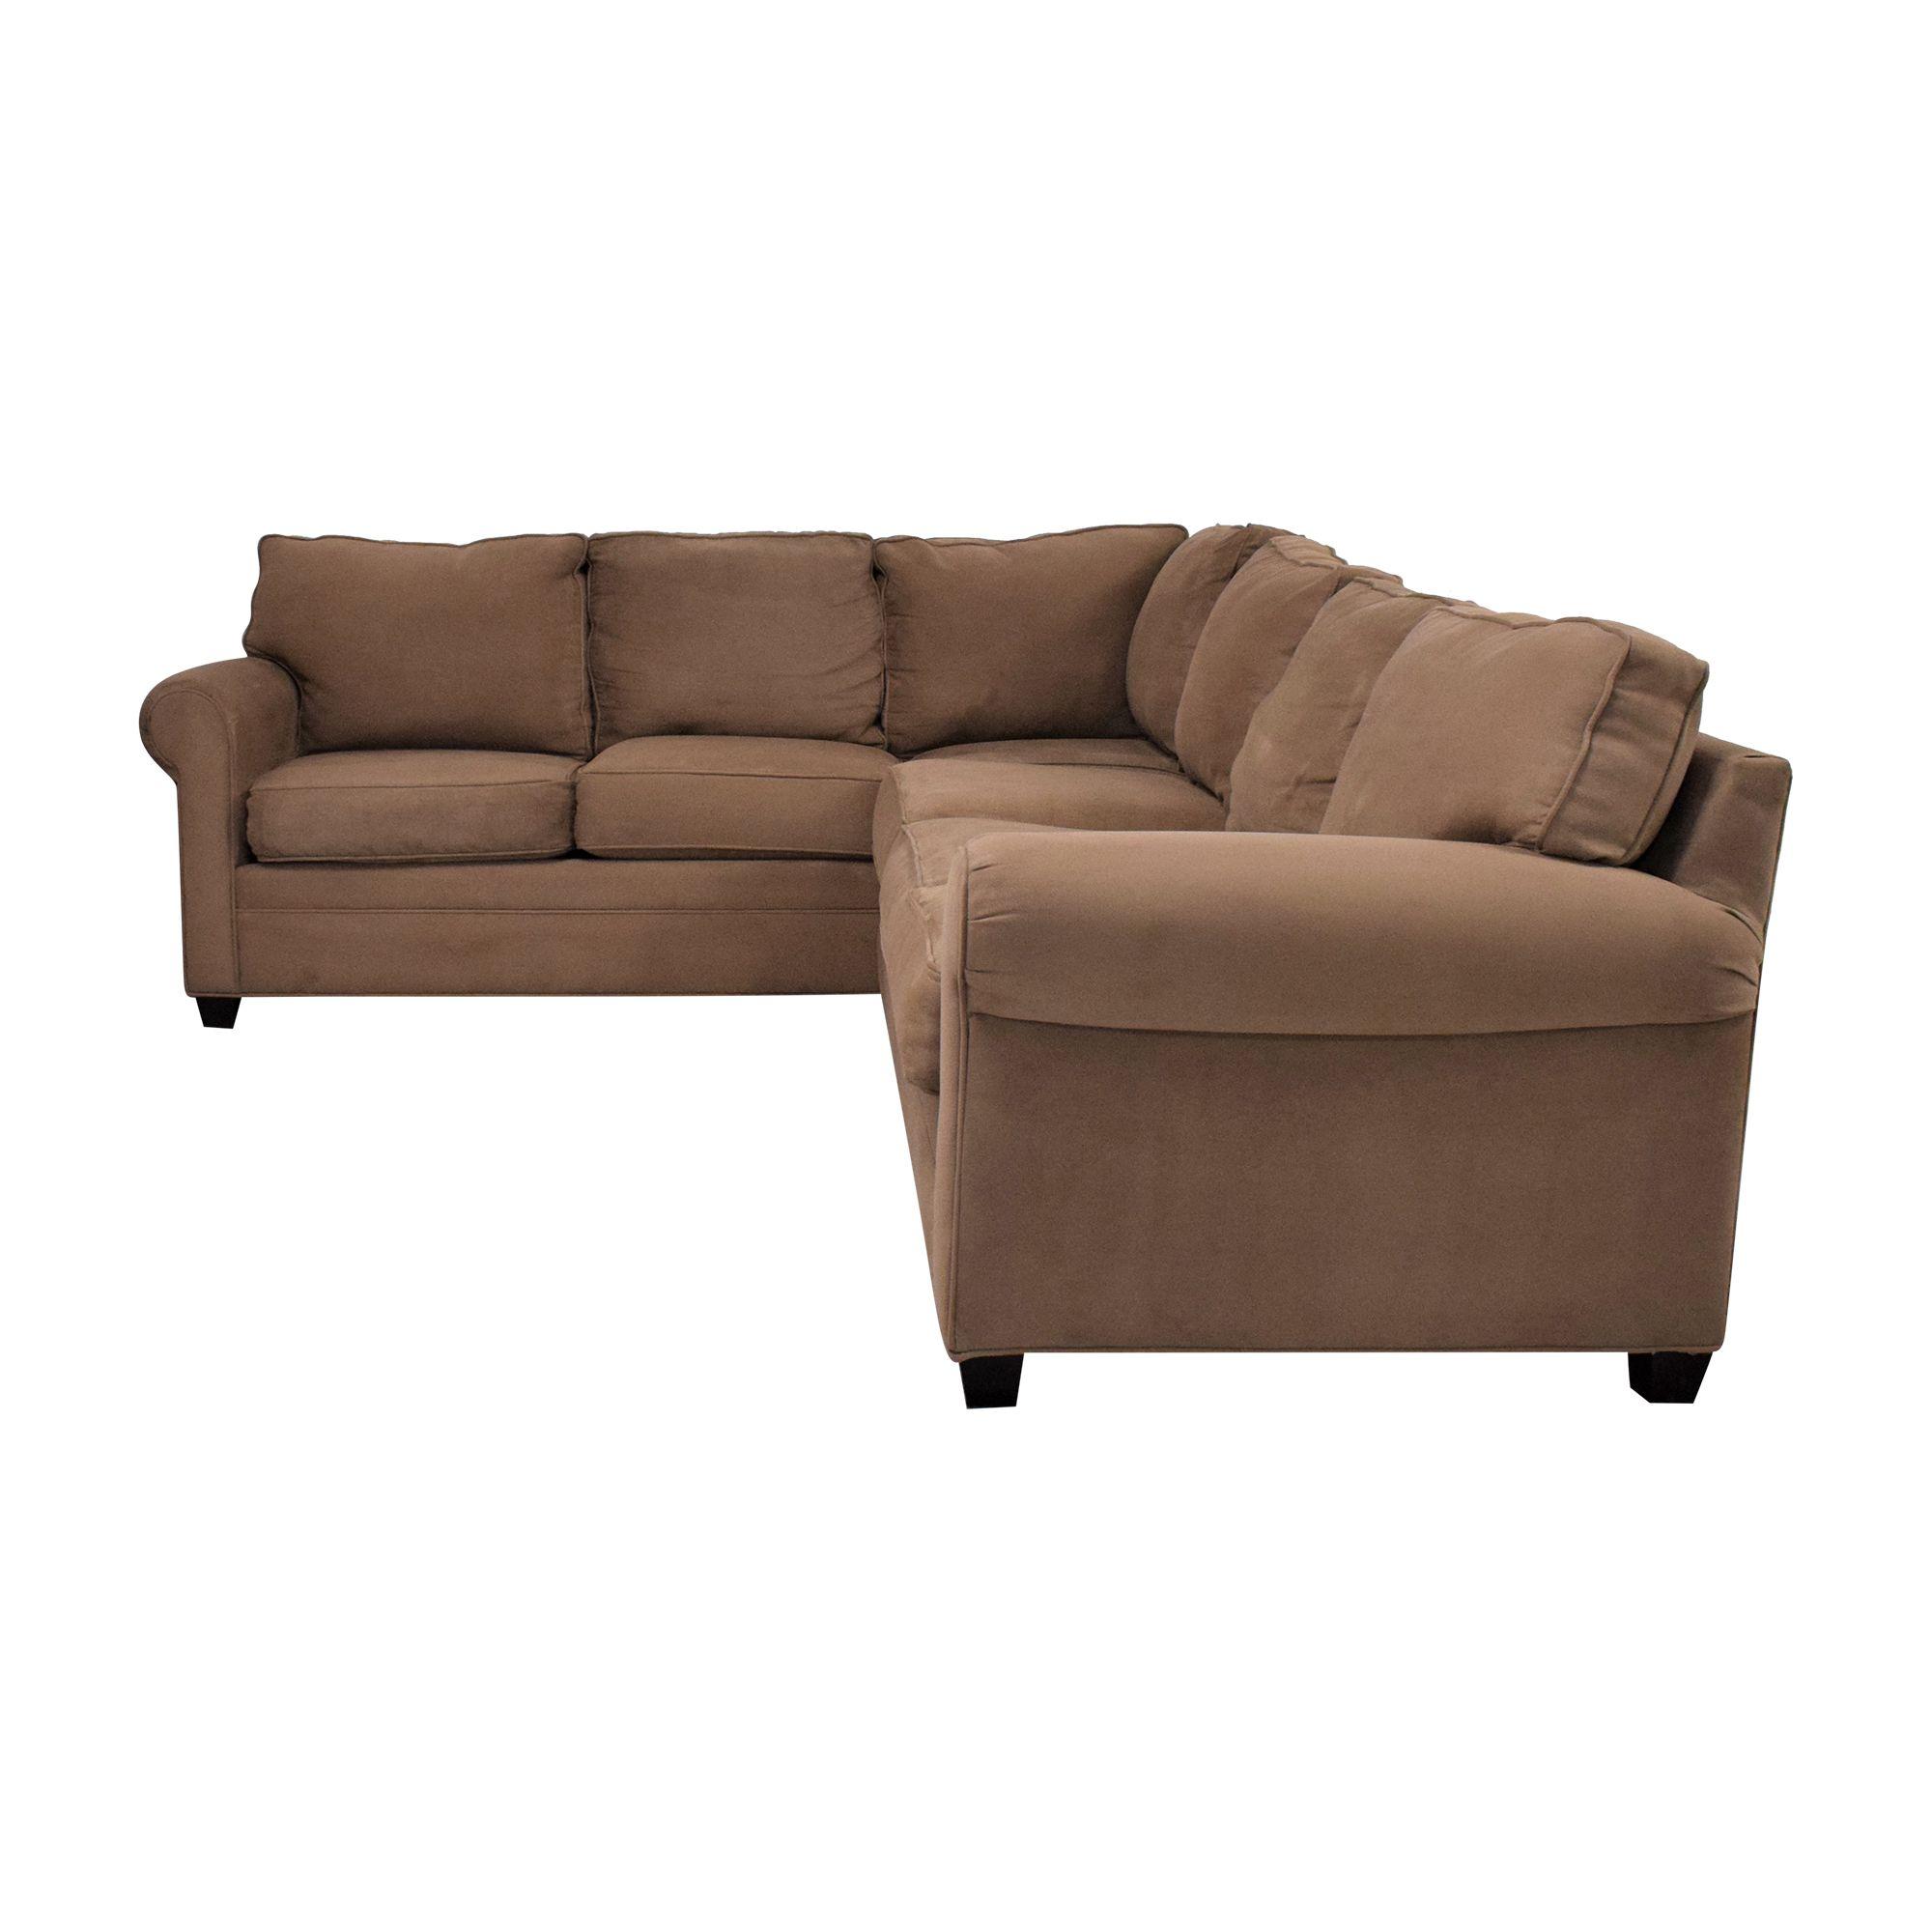 Raymour Flanigan Sectional Sofa In 2020 Sectional Sofa Sofa